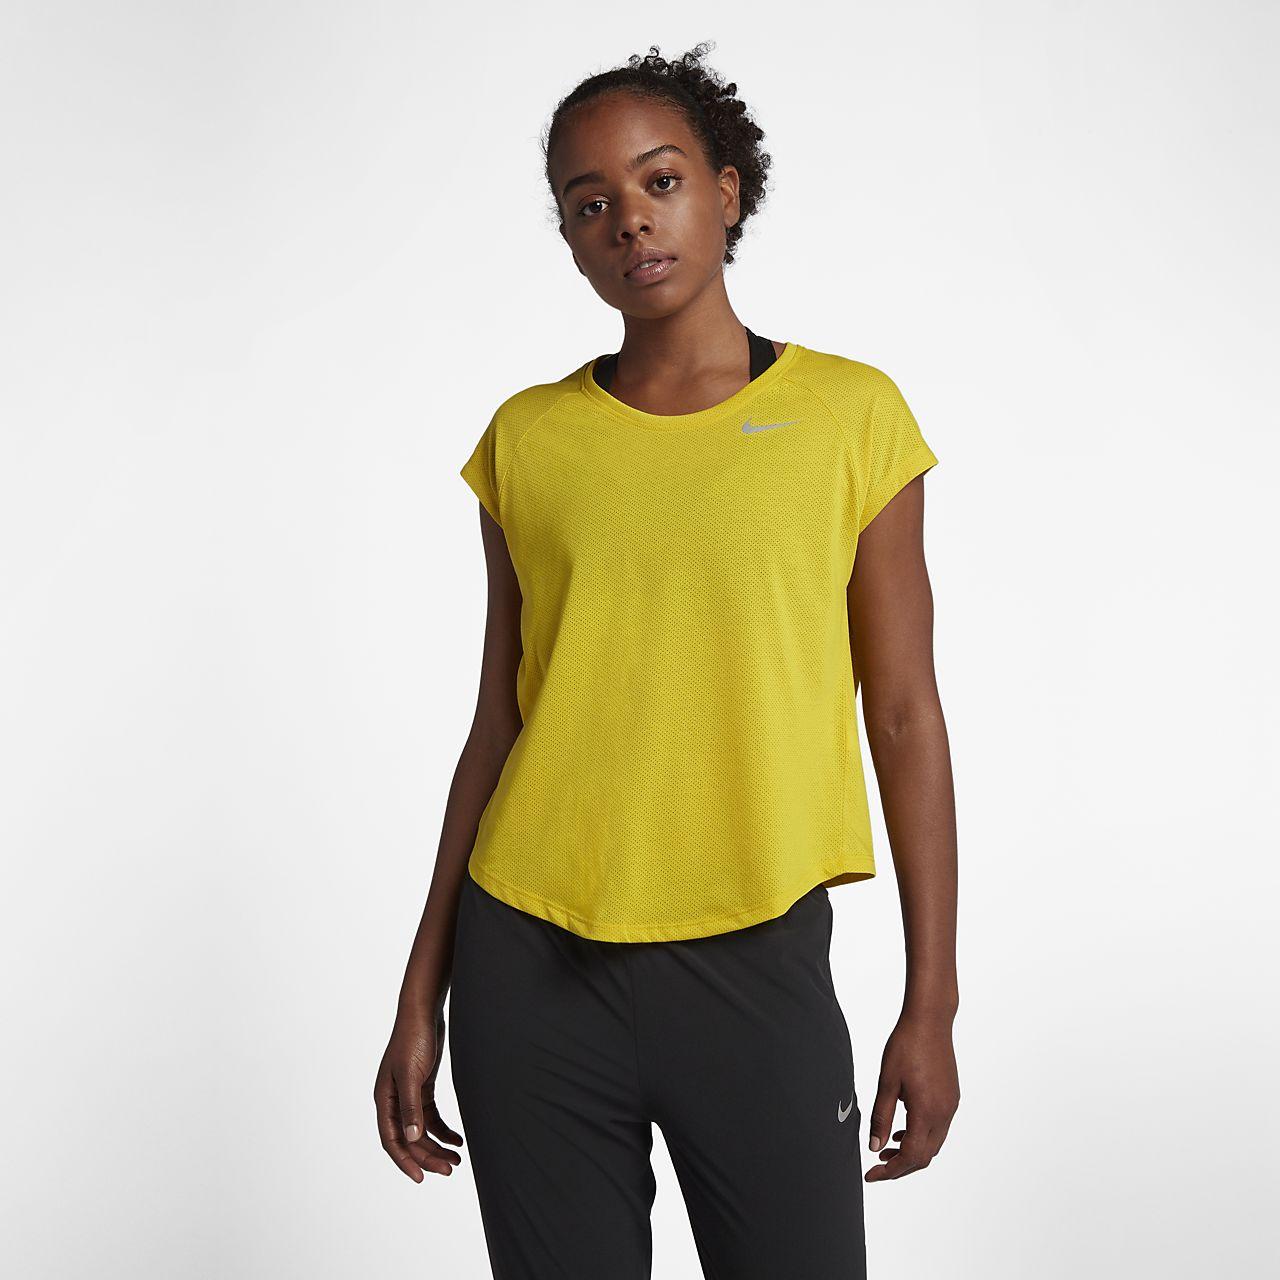 fccecd8354 Nike Tailwind Women's Short-Sleeve Running Top. Nike.com AU